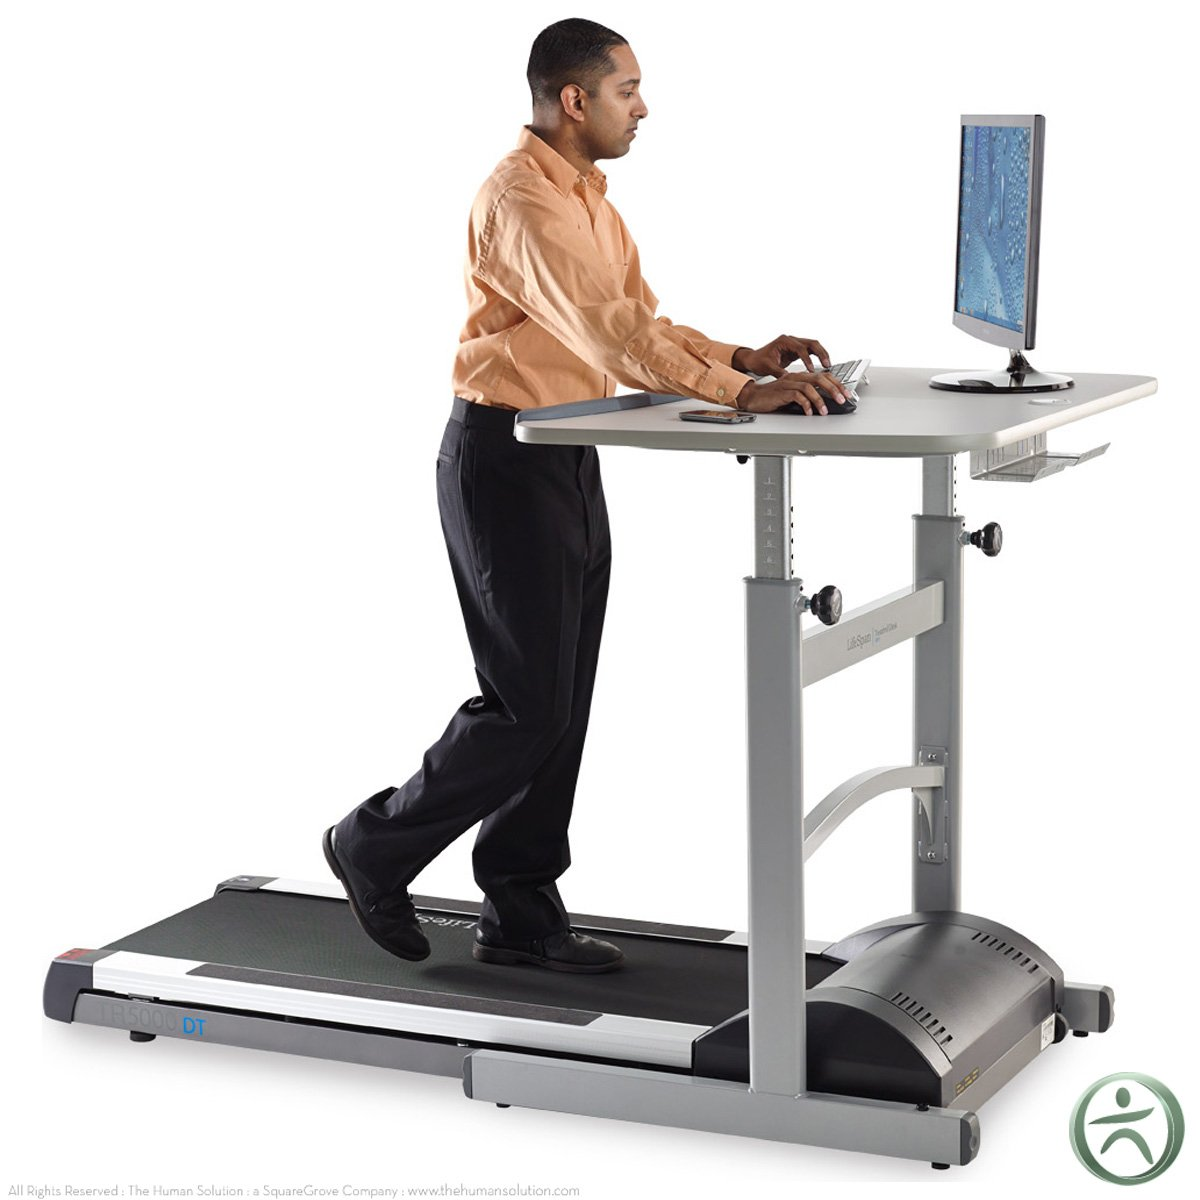 under lifespan best customer buyer reviews treadmill desk s guide